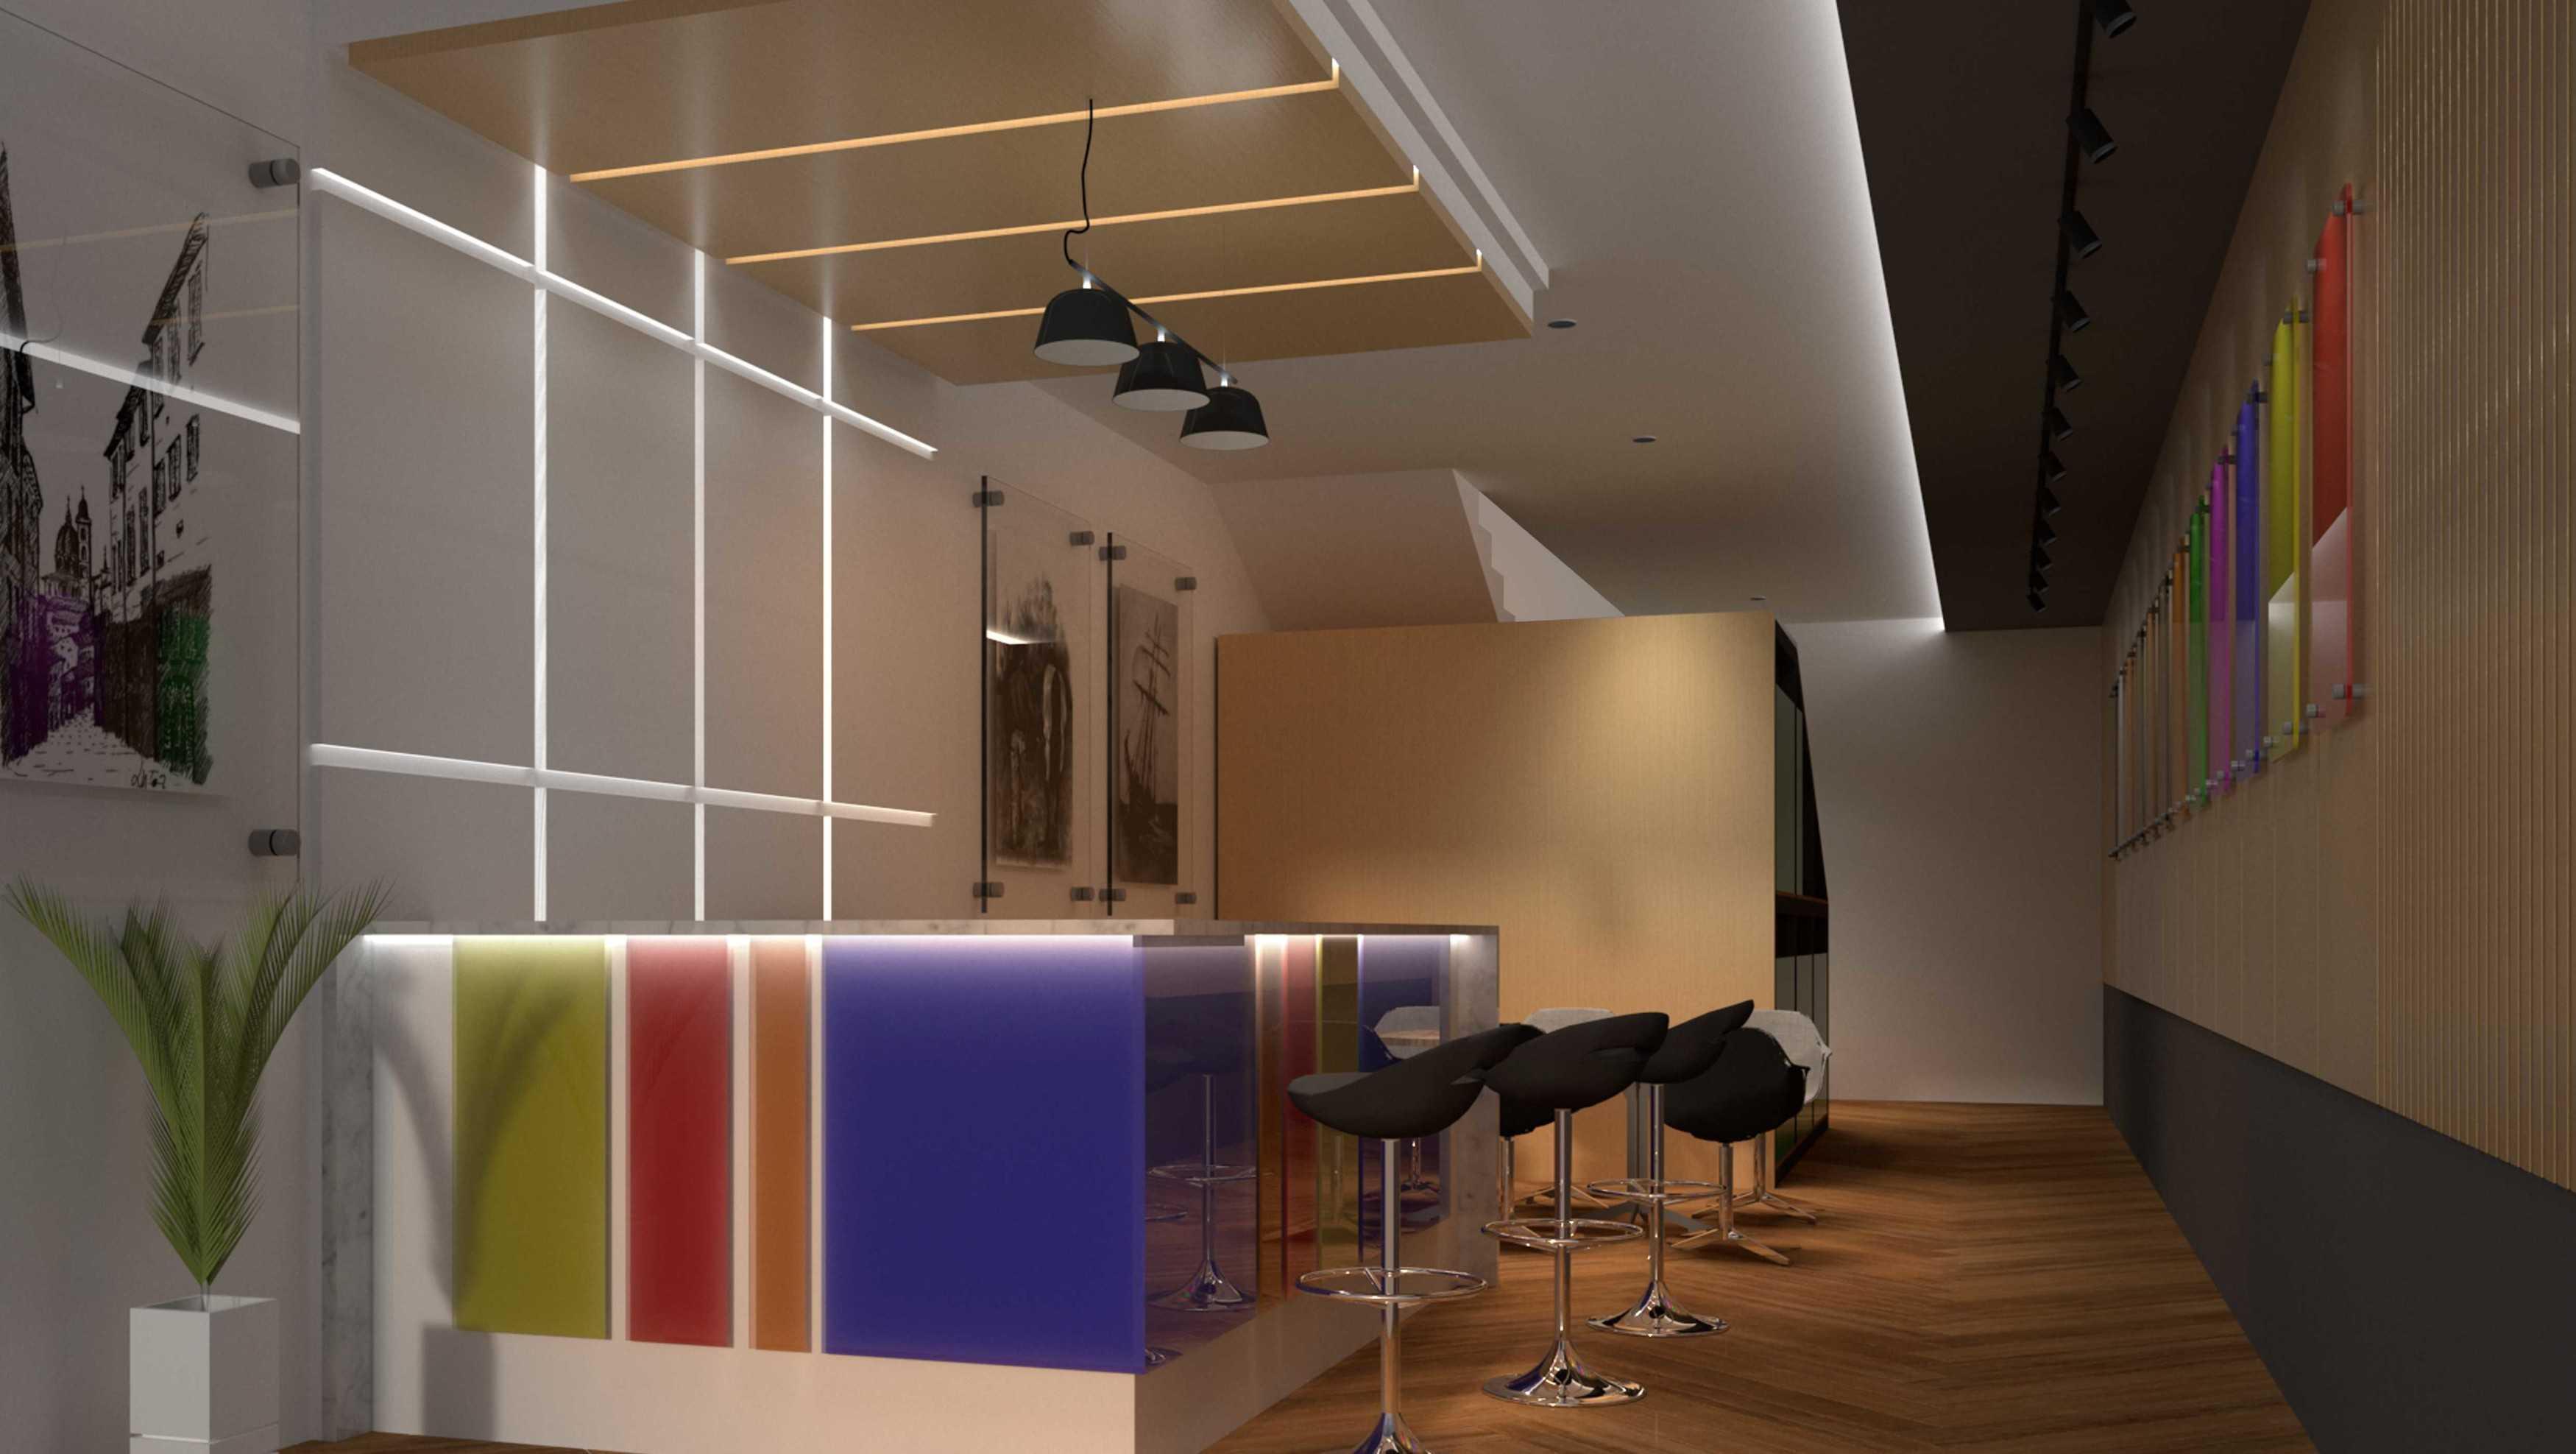 Yrs Design Interior Acrylic Store Kota Tgr. Sel., Kota Tangerang Selatan, Banten, Indonesia Kota Tgr. Sel., Kota Tangerang Selatan, Banten, Indonesia Yrs-Design-Interior-Acrylic-Store   112764